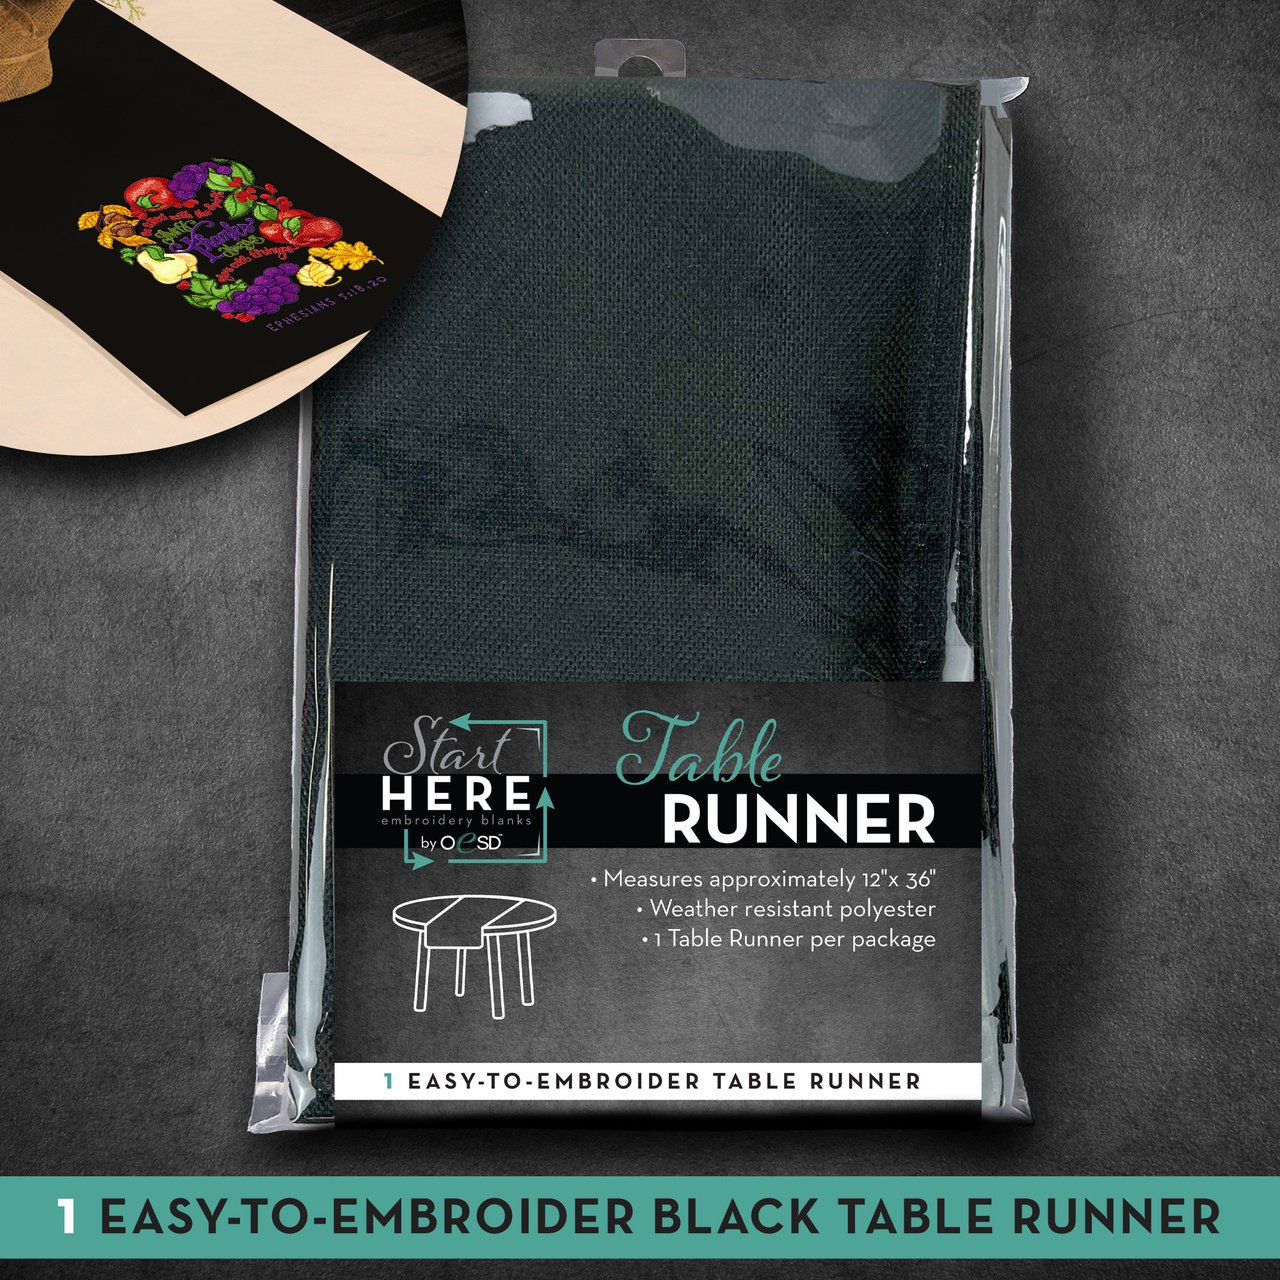 OESD Table Runner Black